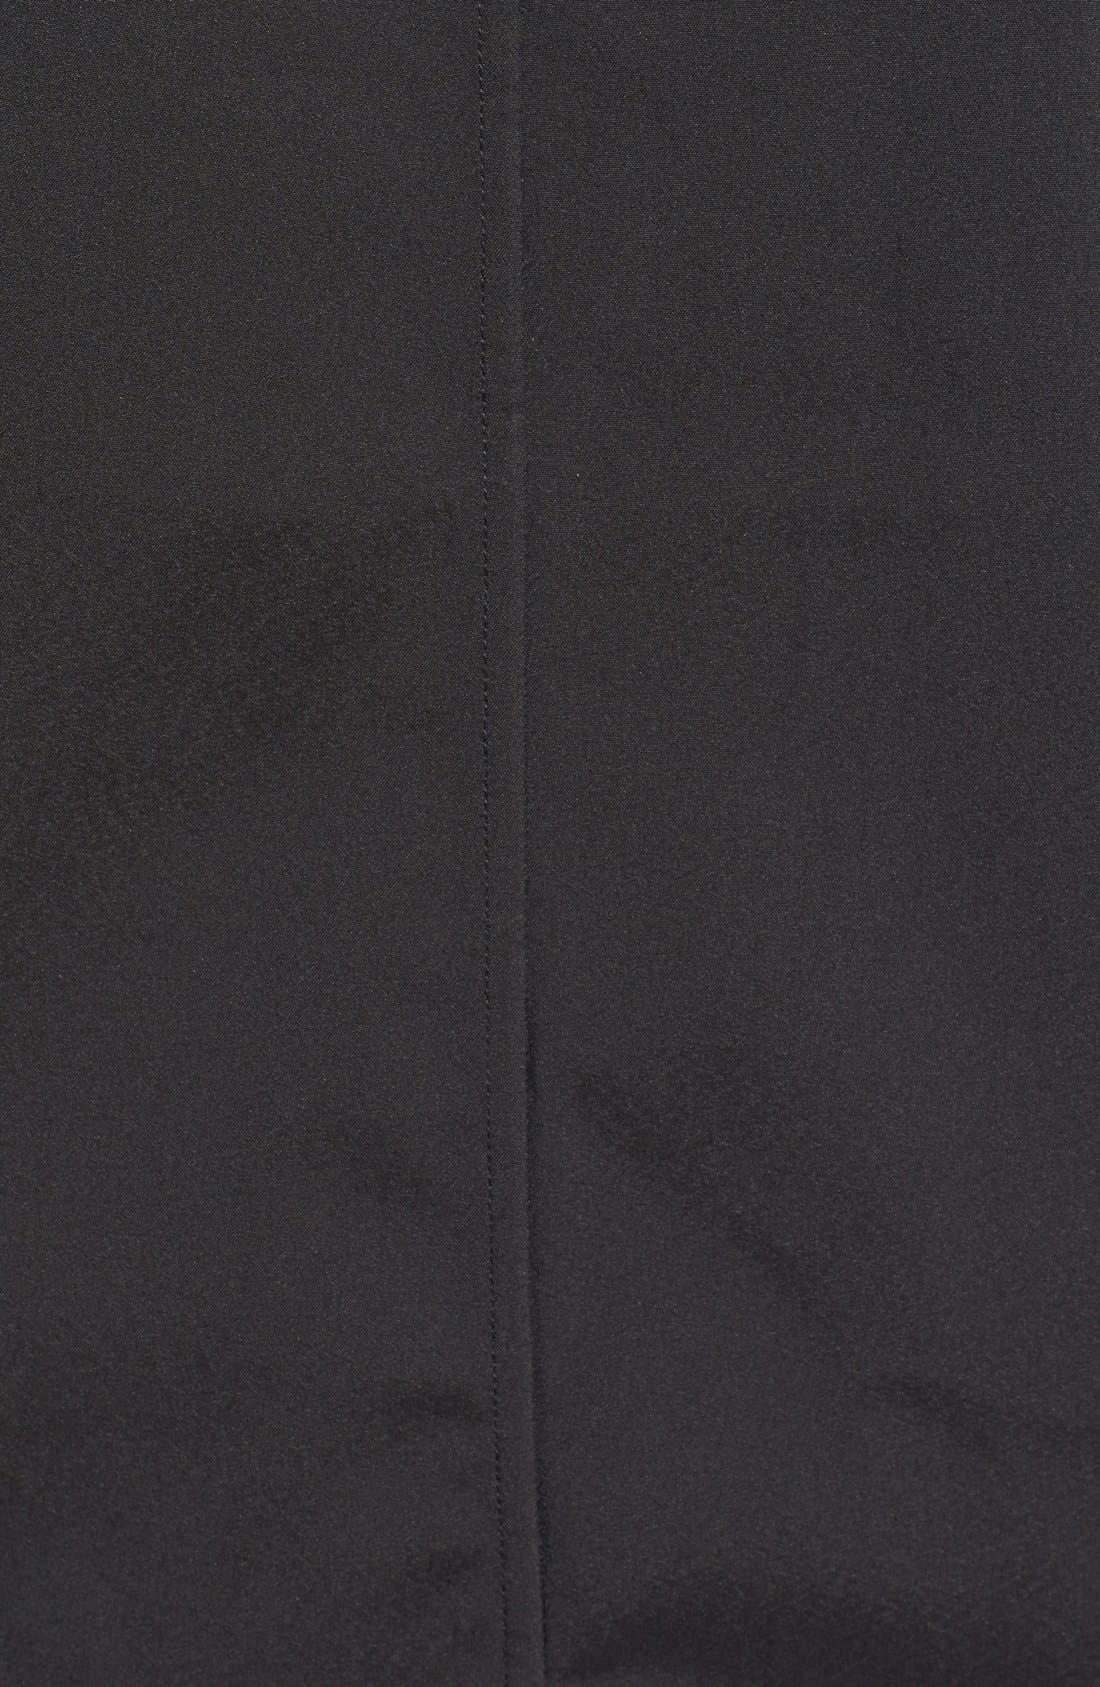 THE NORTH FACE,                             'Macarthur' Soft Shell Mac Coat,                             Alternate thumbnail 3, color,                             001